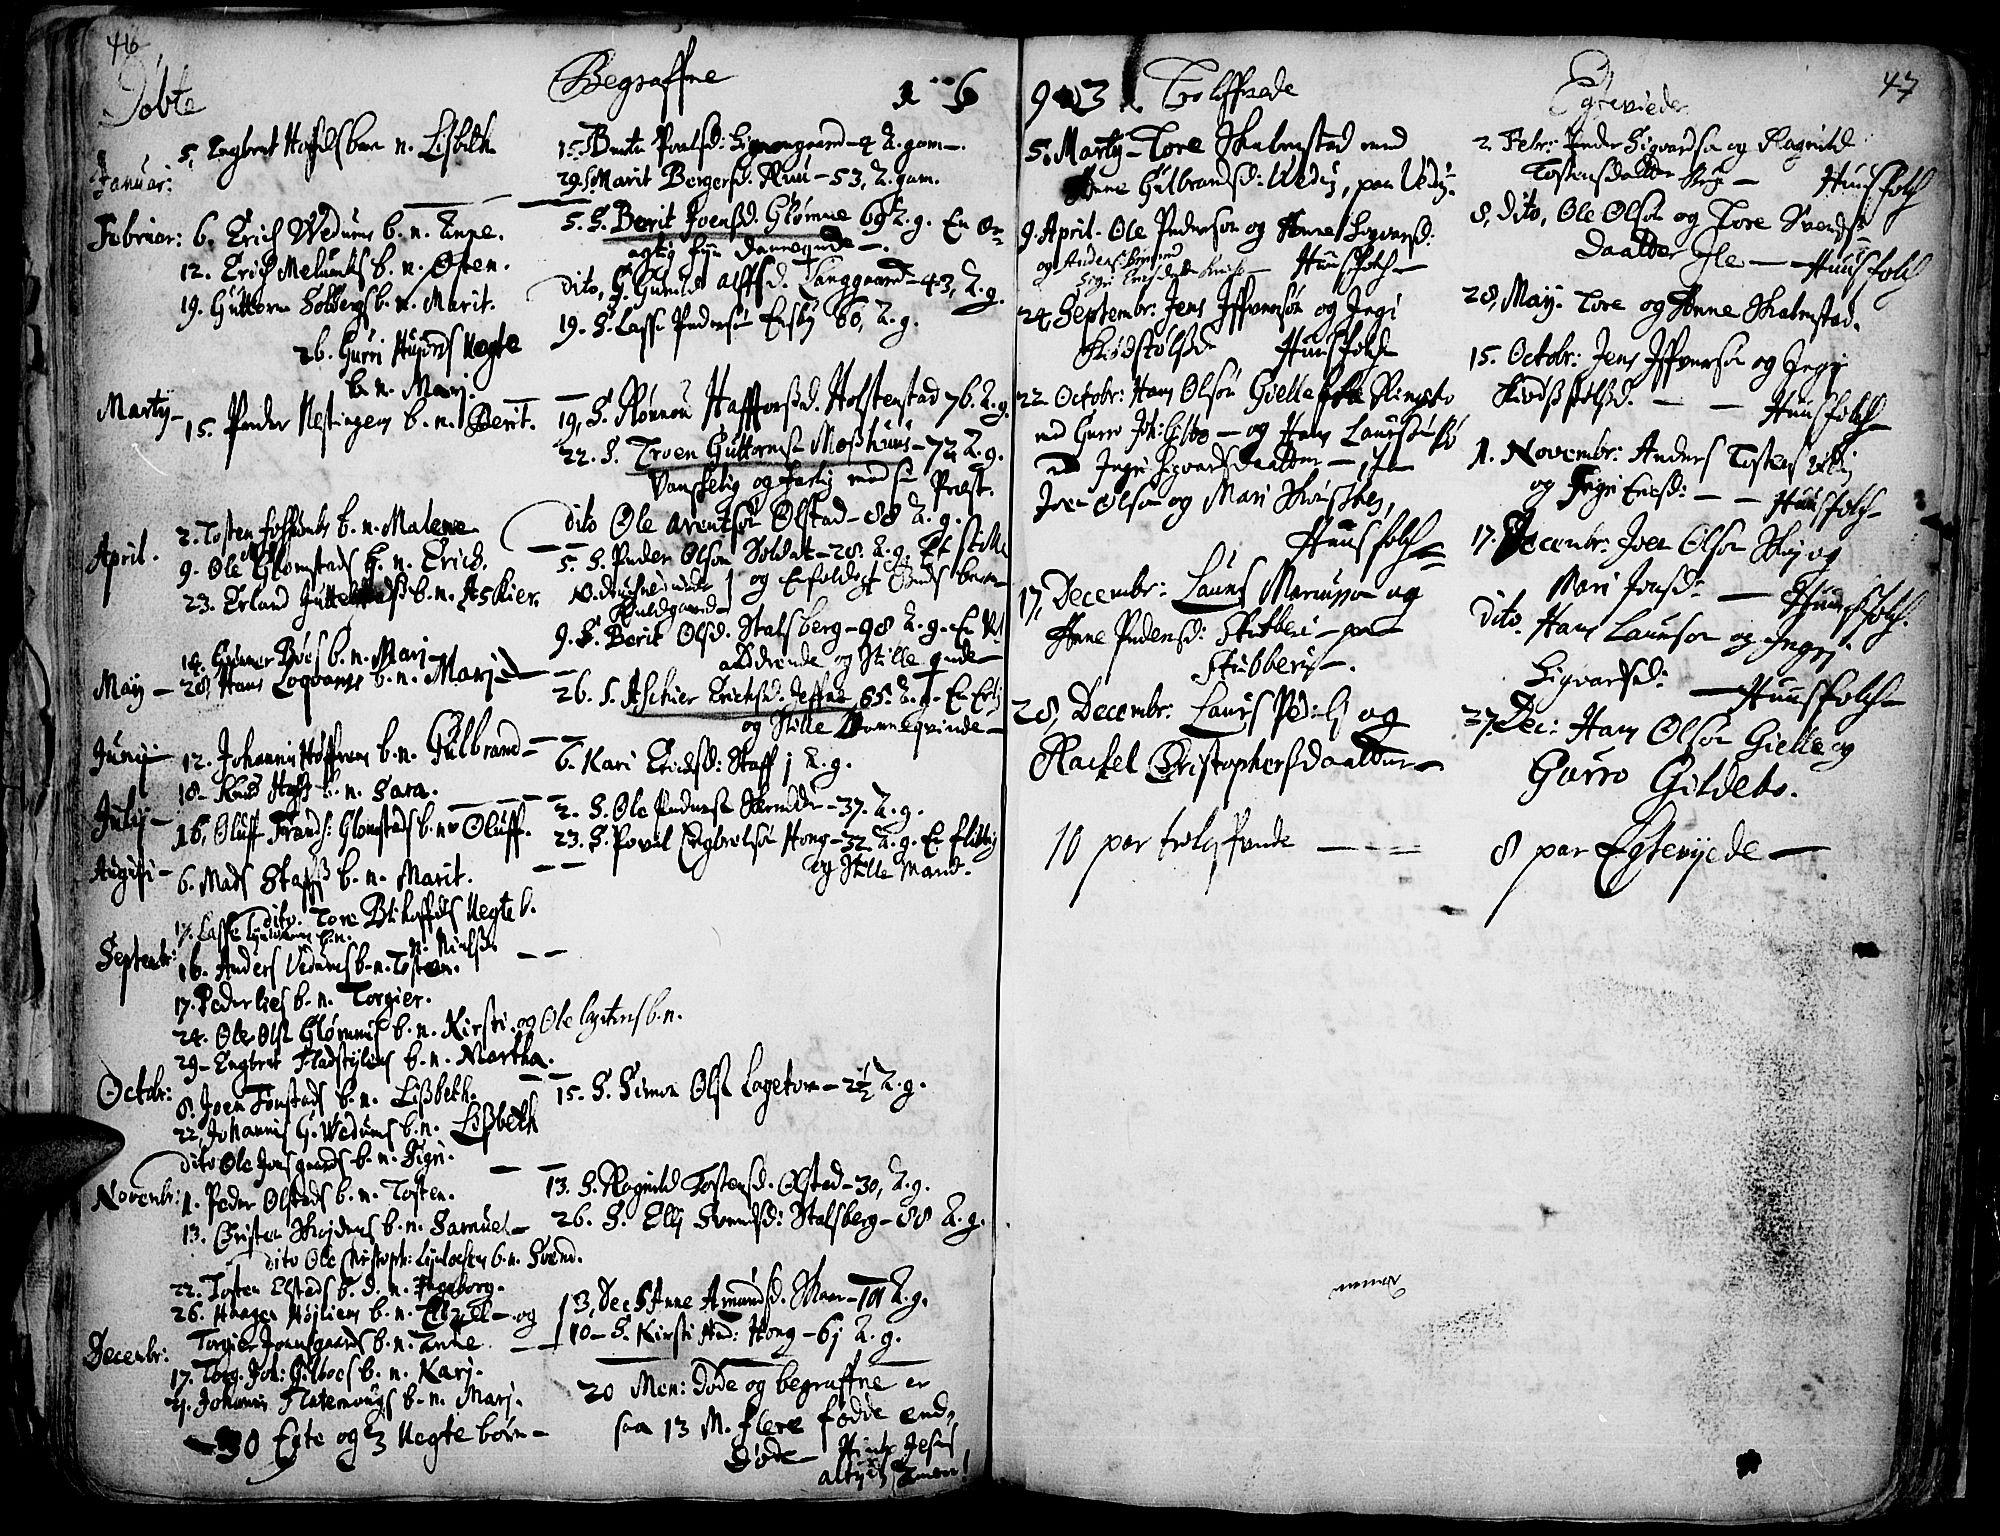 SAH, Øyer prestekontor, Ministerialbok nr. 1, 1671-1727, s. 46-47